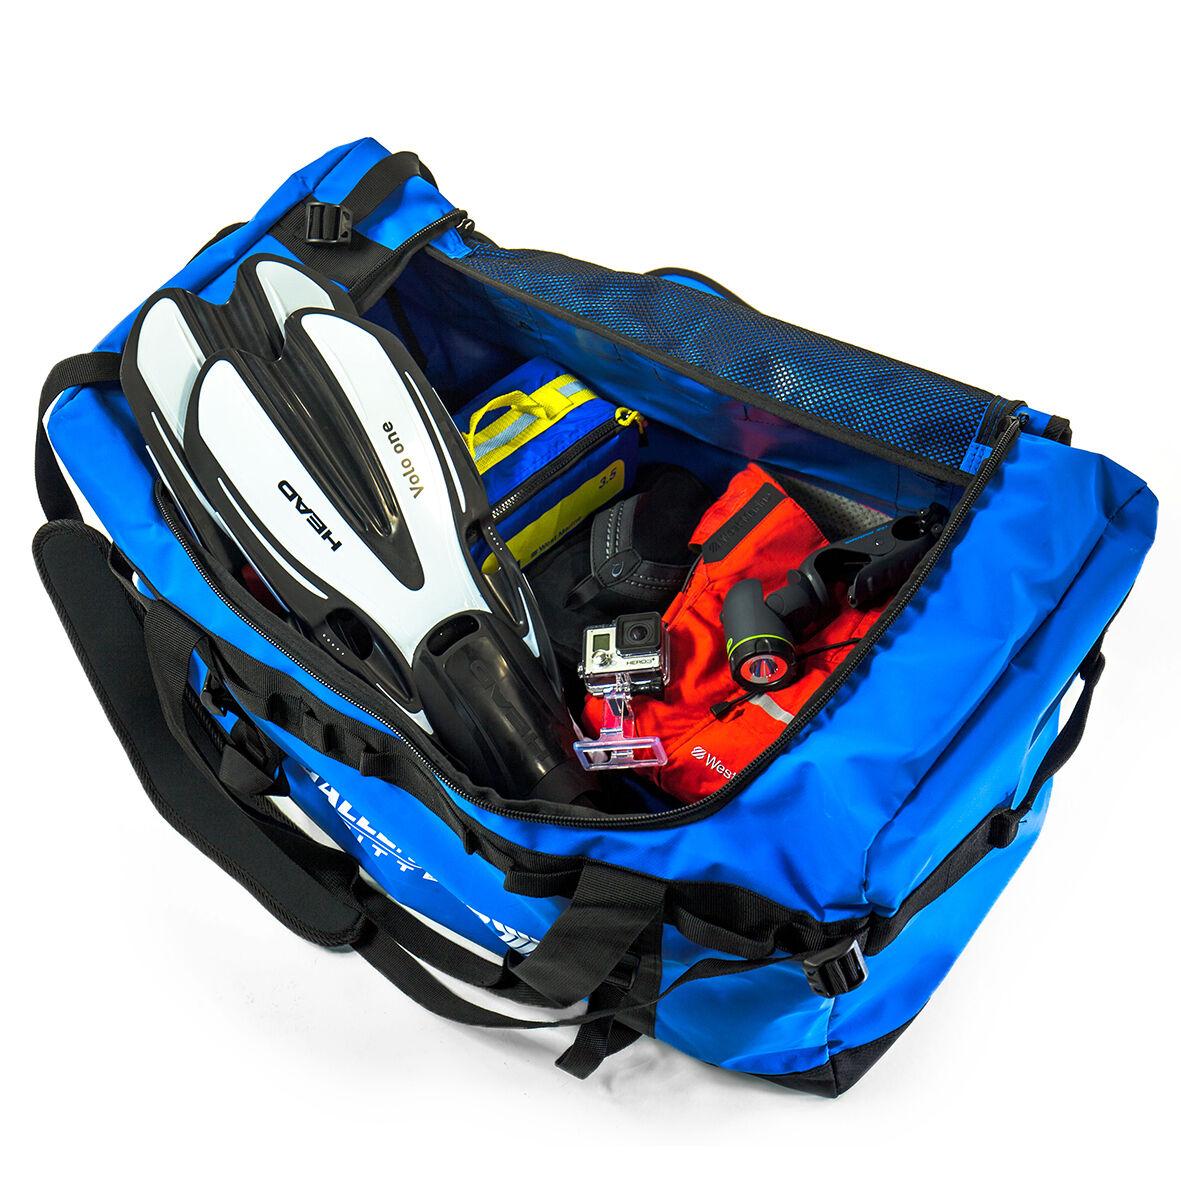 Marine Duffel Dry Bag For Boating Camping Hiking Kayak Large Water Resistant